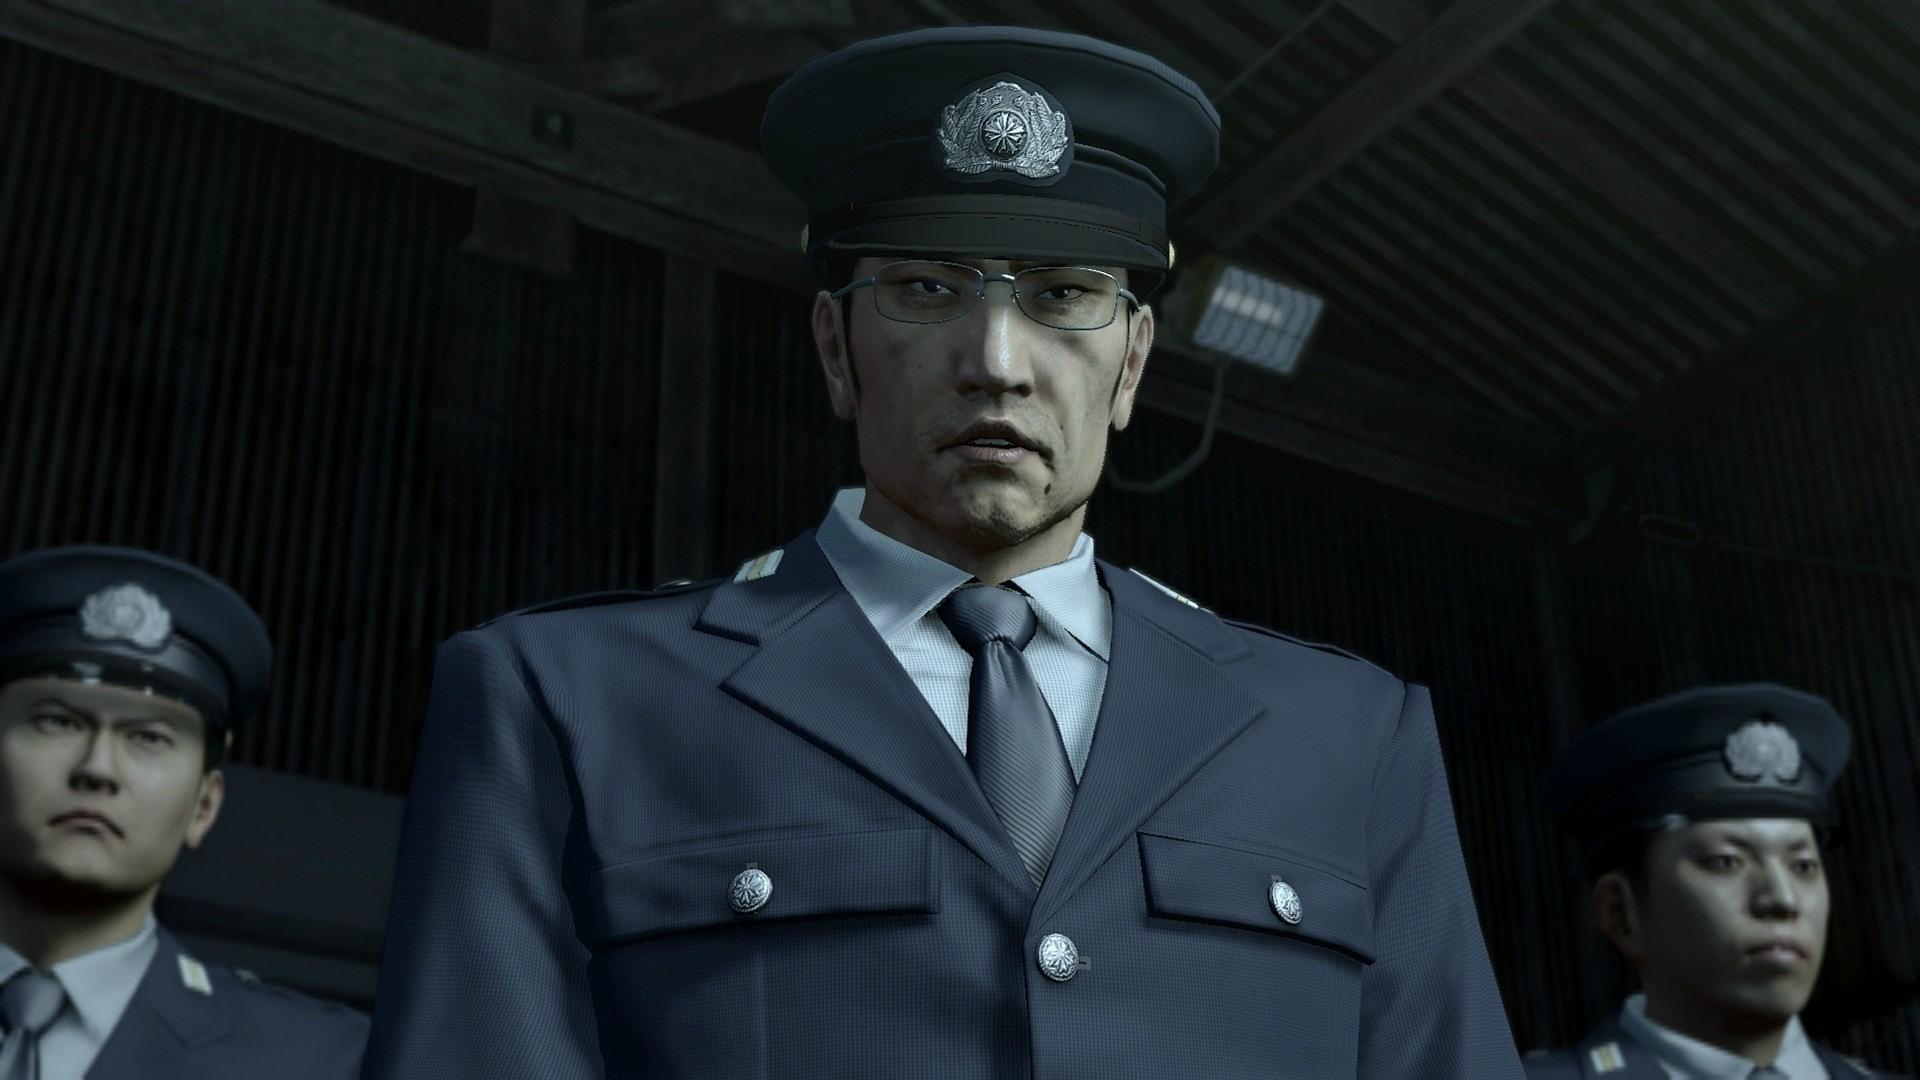 Screenshoty a artworky z Yakuza 5 68628